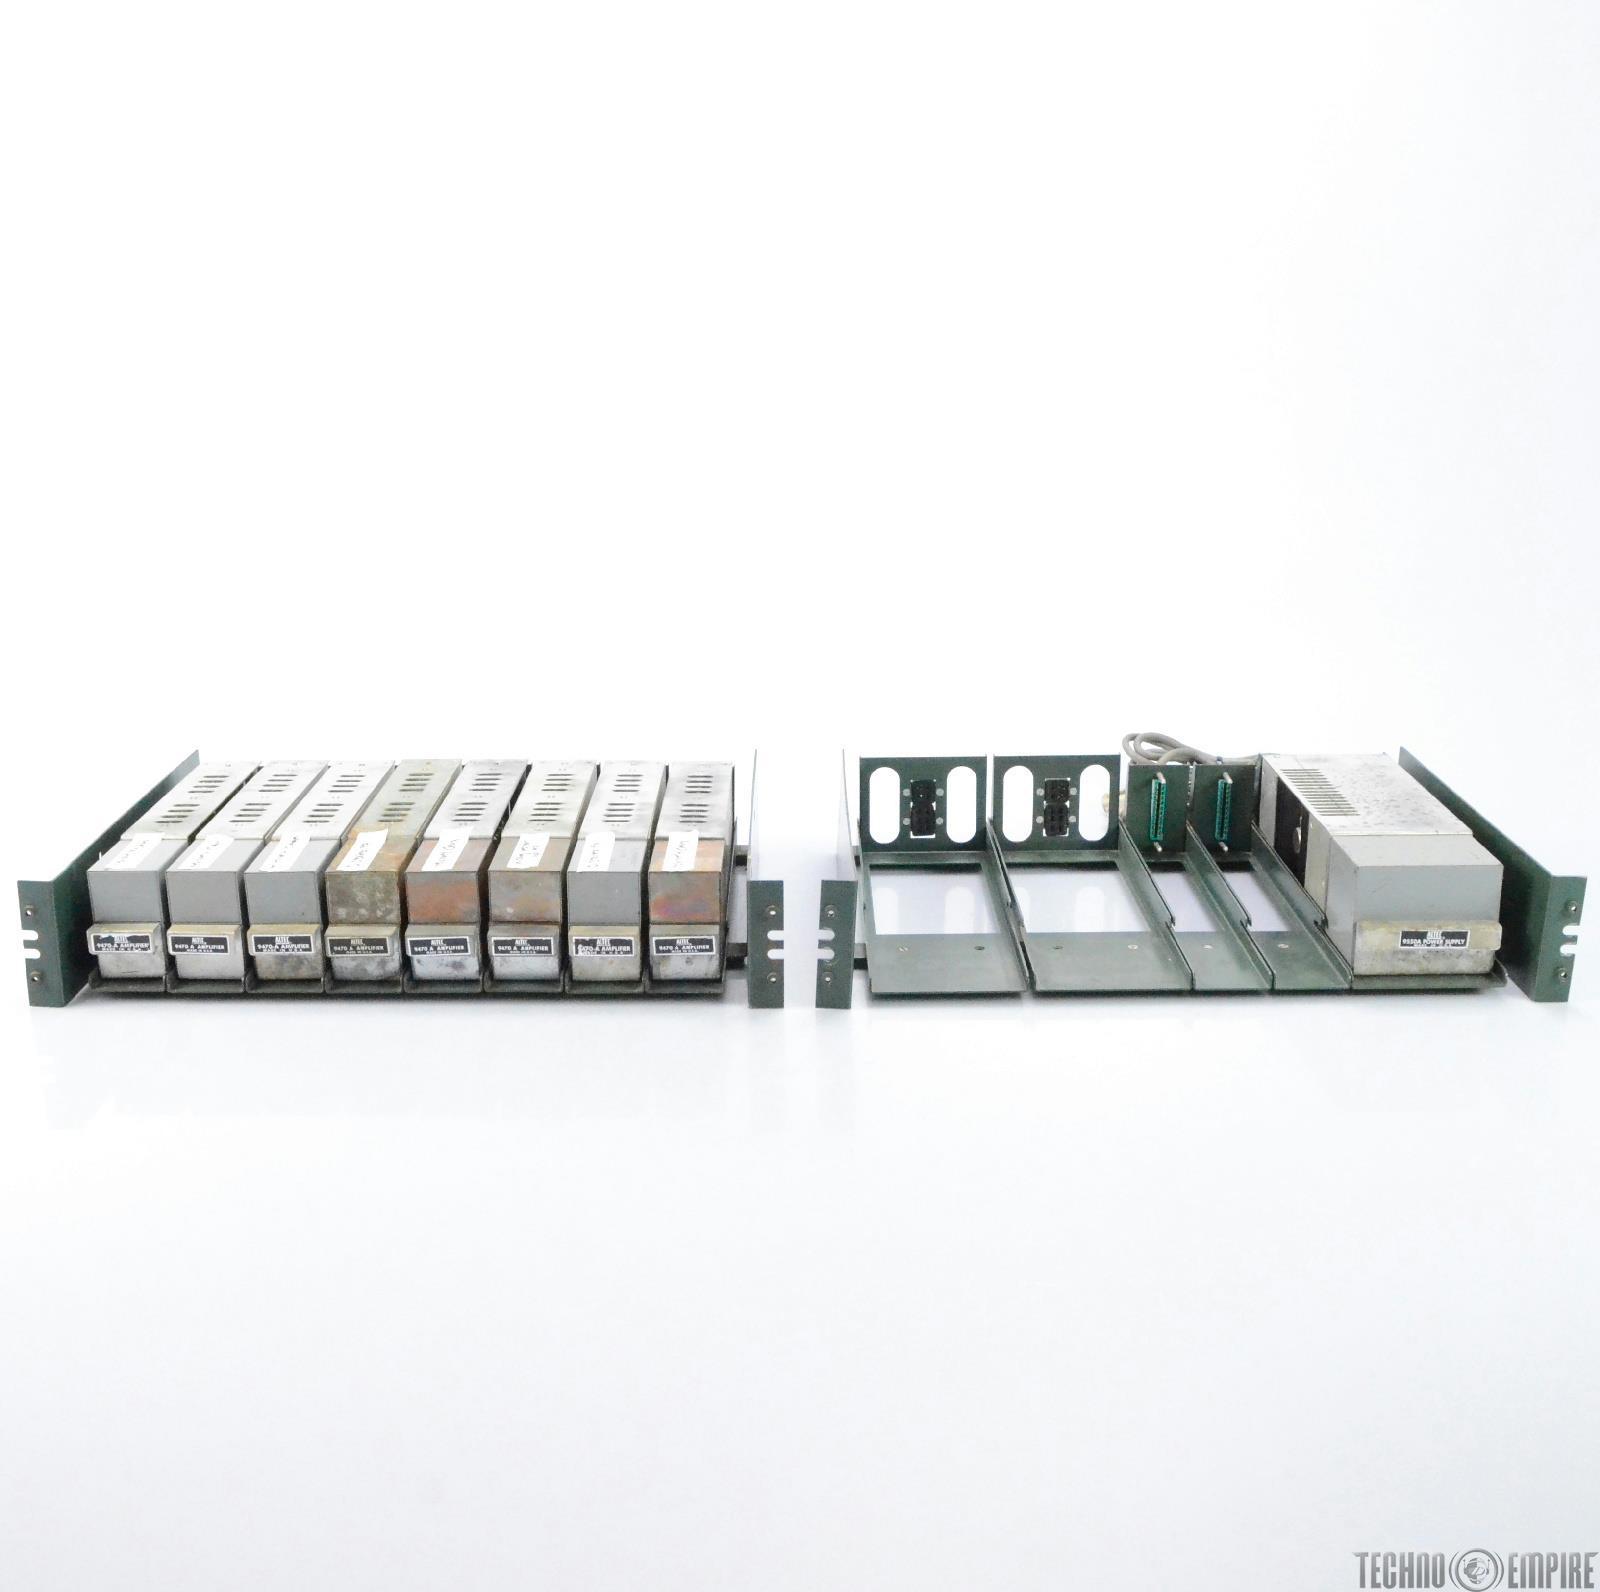 8 Altec 9470 A Amplifiers & 9550A PSU w/ 9800A Frames Fairfax Recordings #28582